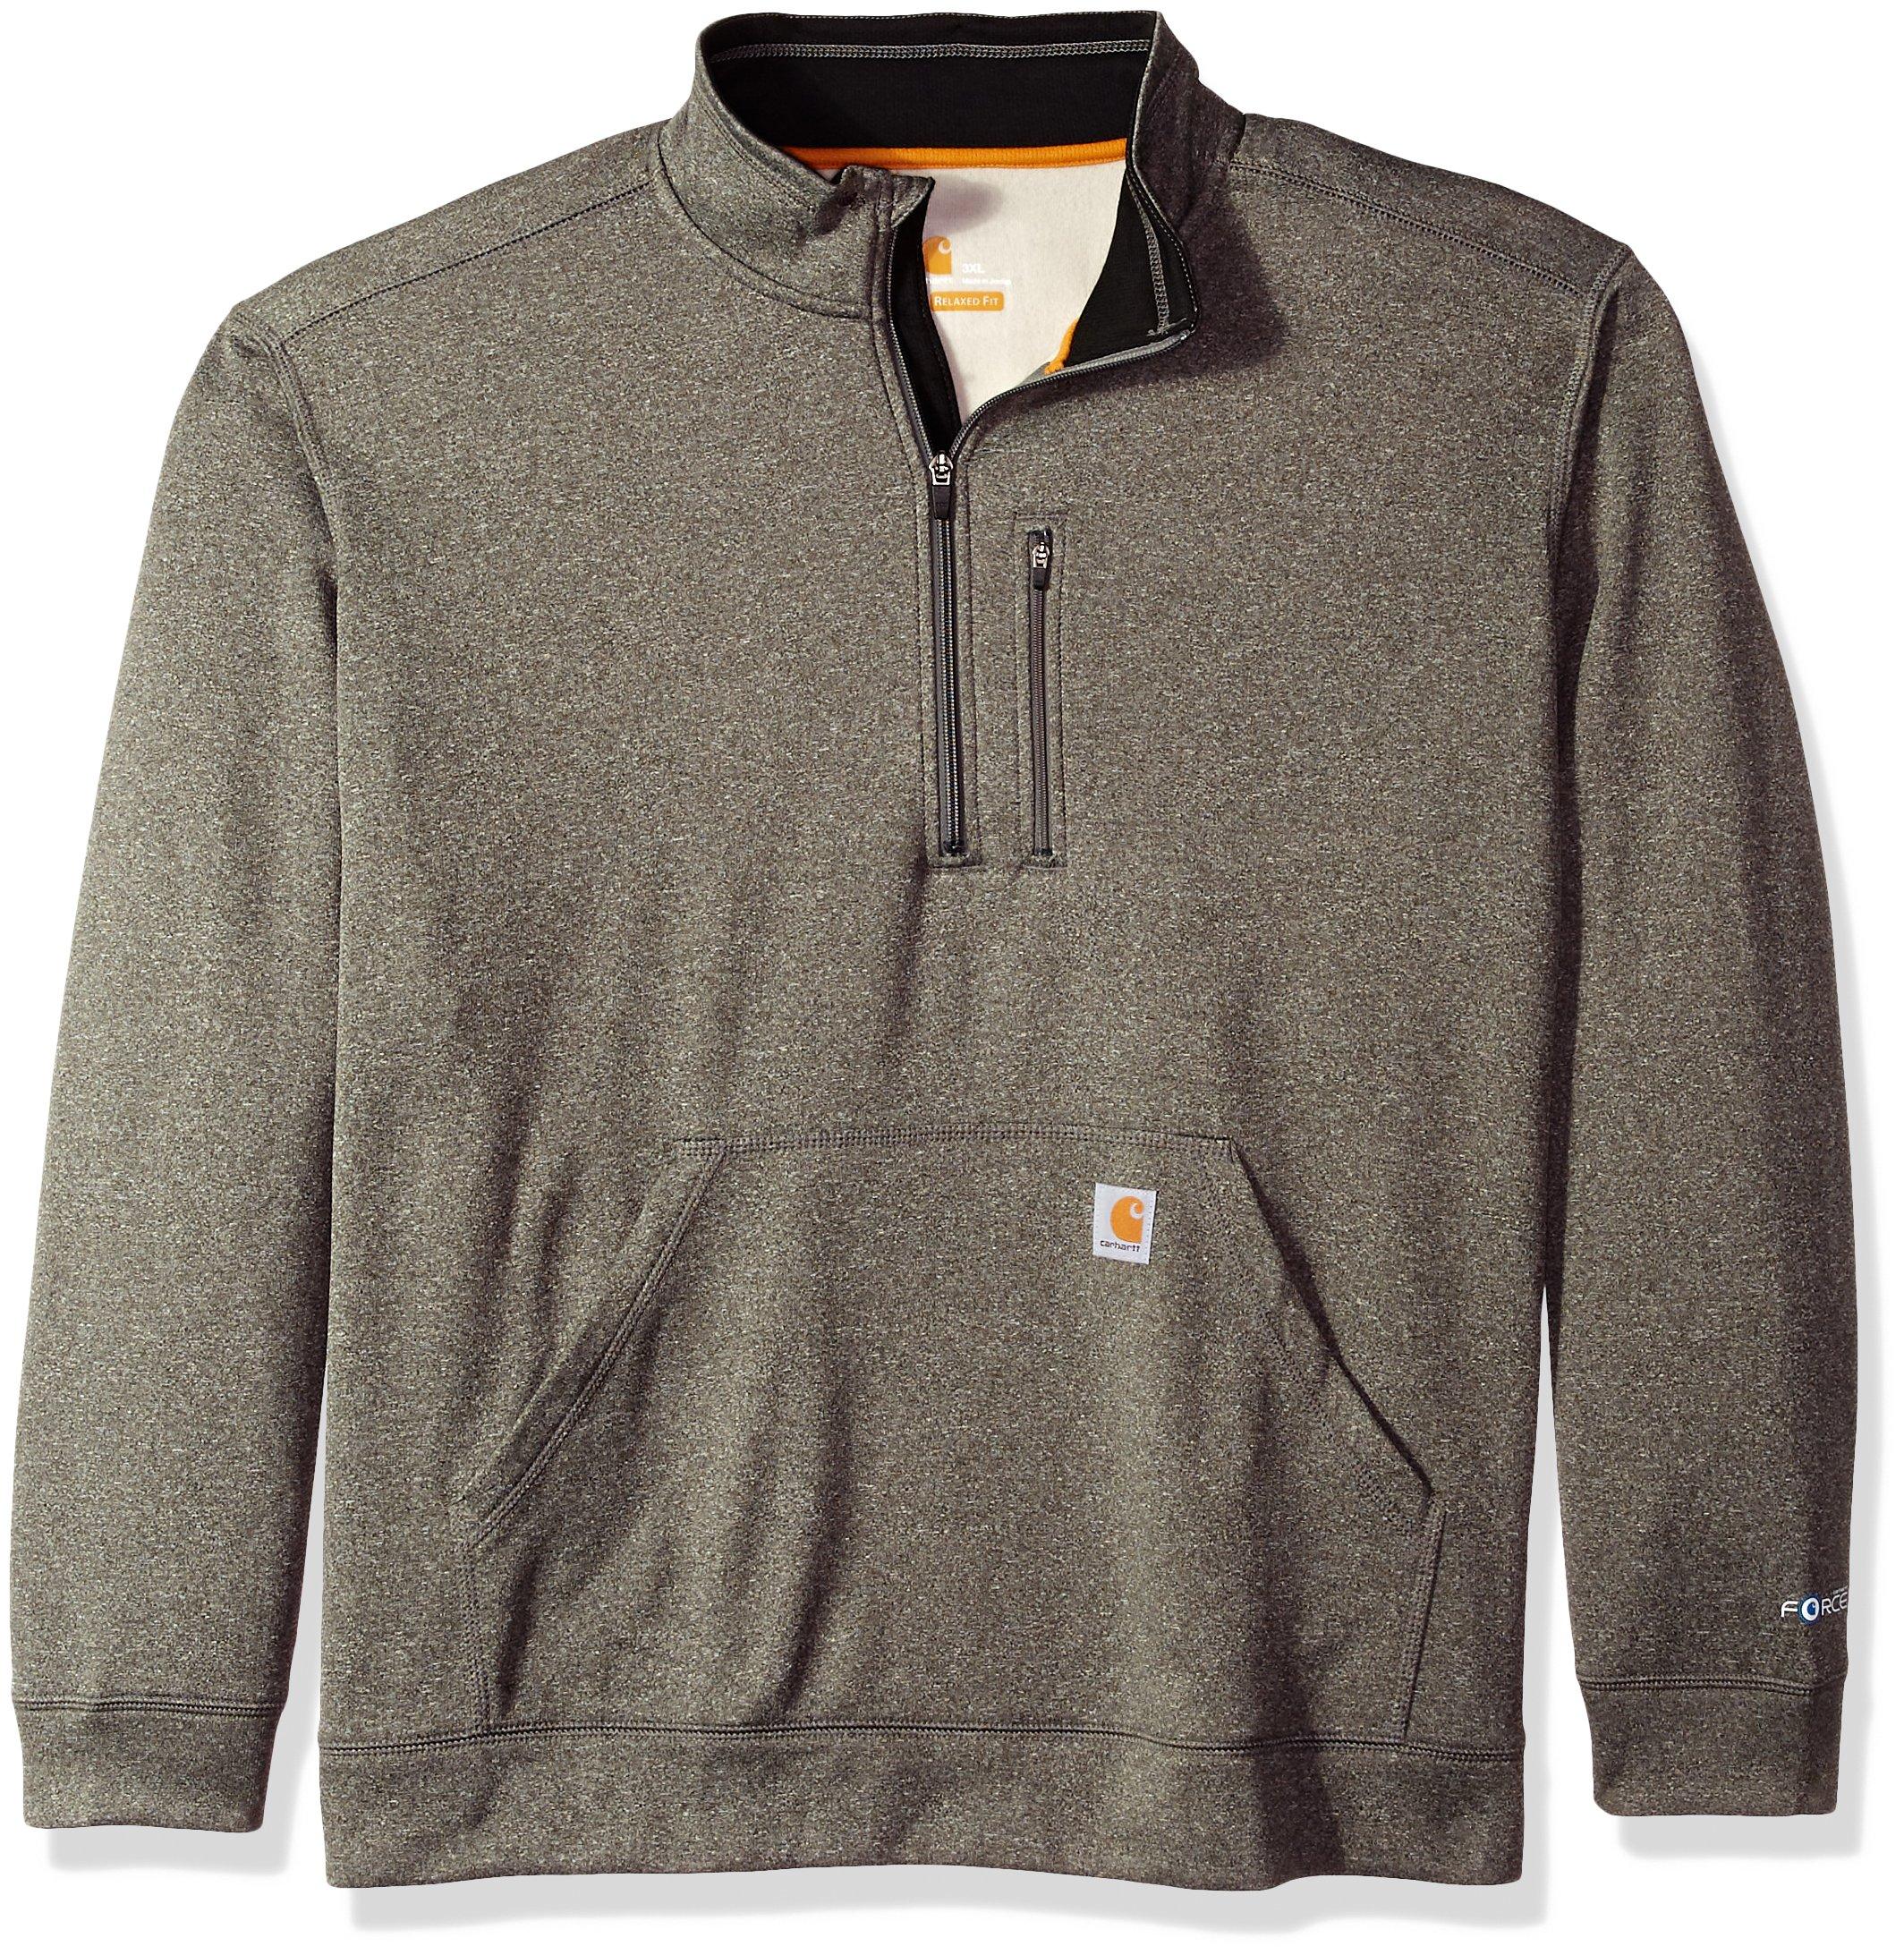 Carhartt Men's Force Extremes Mock-Neck Half-Zip Sweatshirt (Regular and Big & Tall Sizes), Granite Heather, 3X-Large